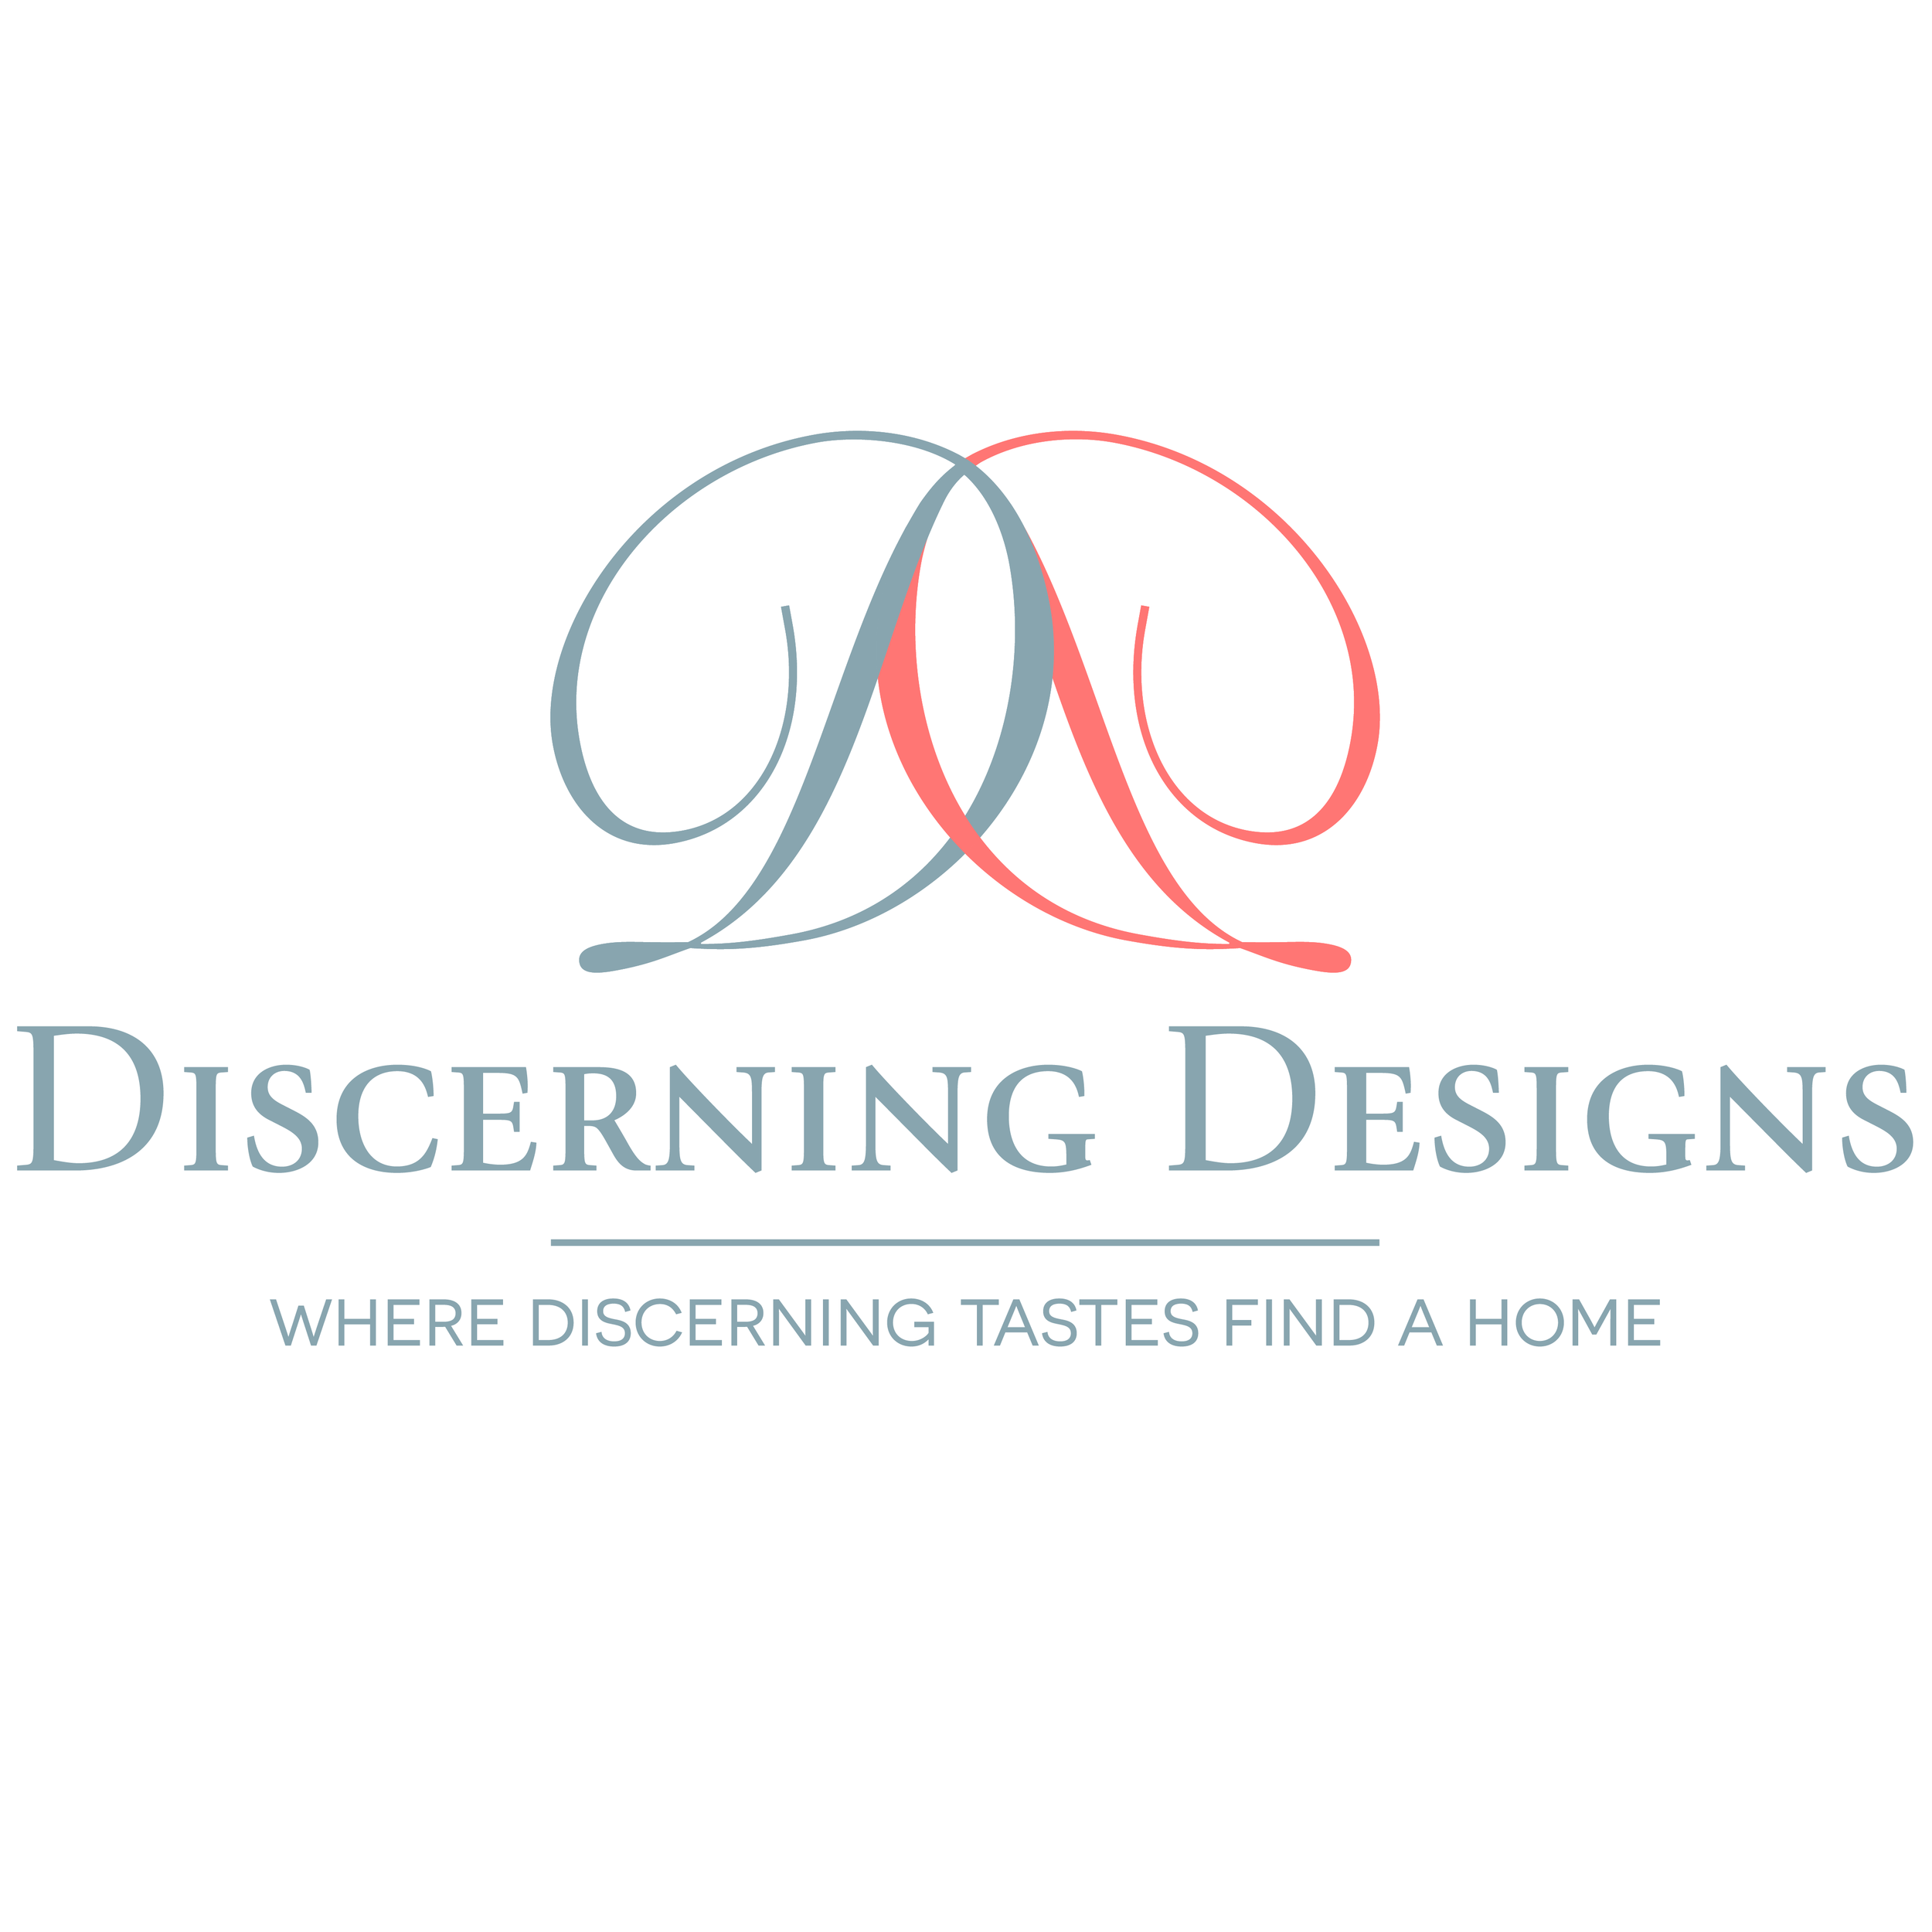 MDD_logos_uniform-05.png